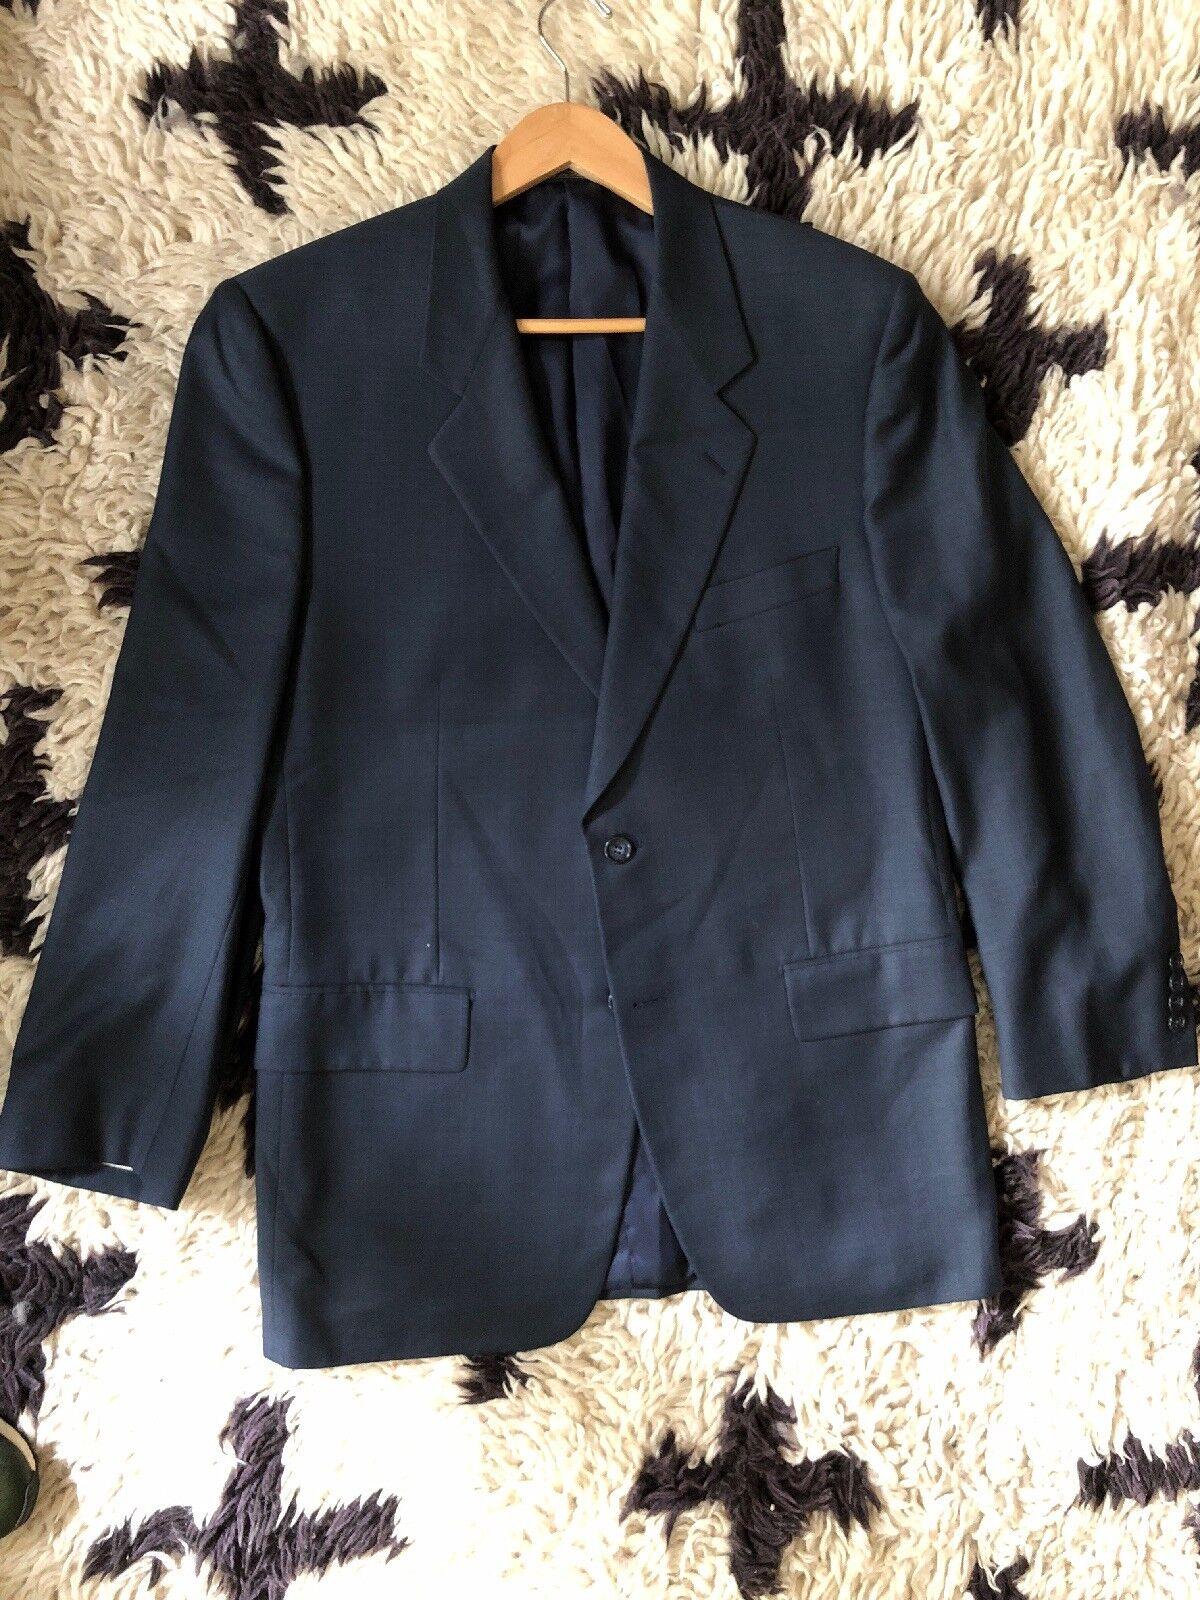 Navy Blau Corneliani Suit - 100% Wool - 40R 34x29